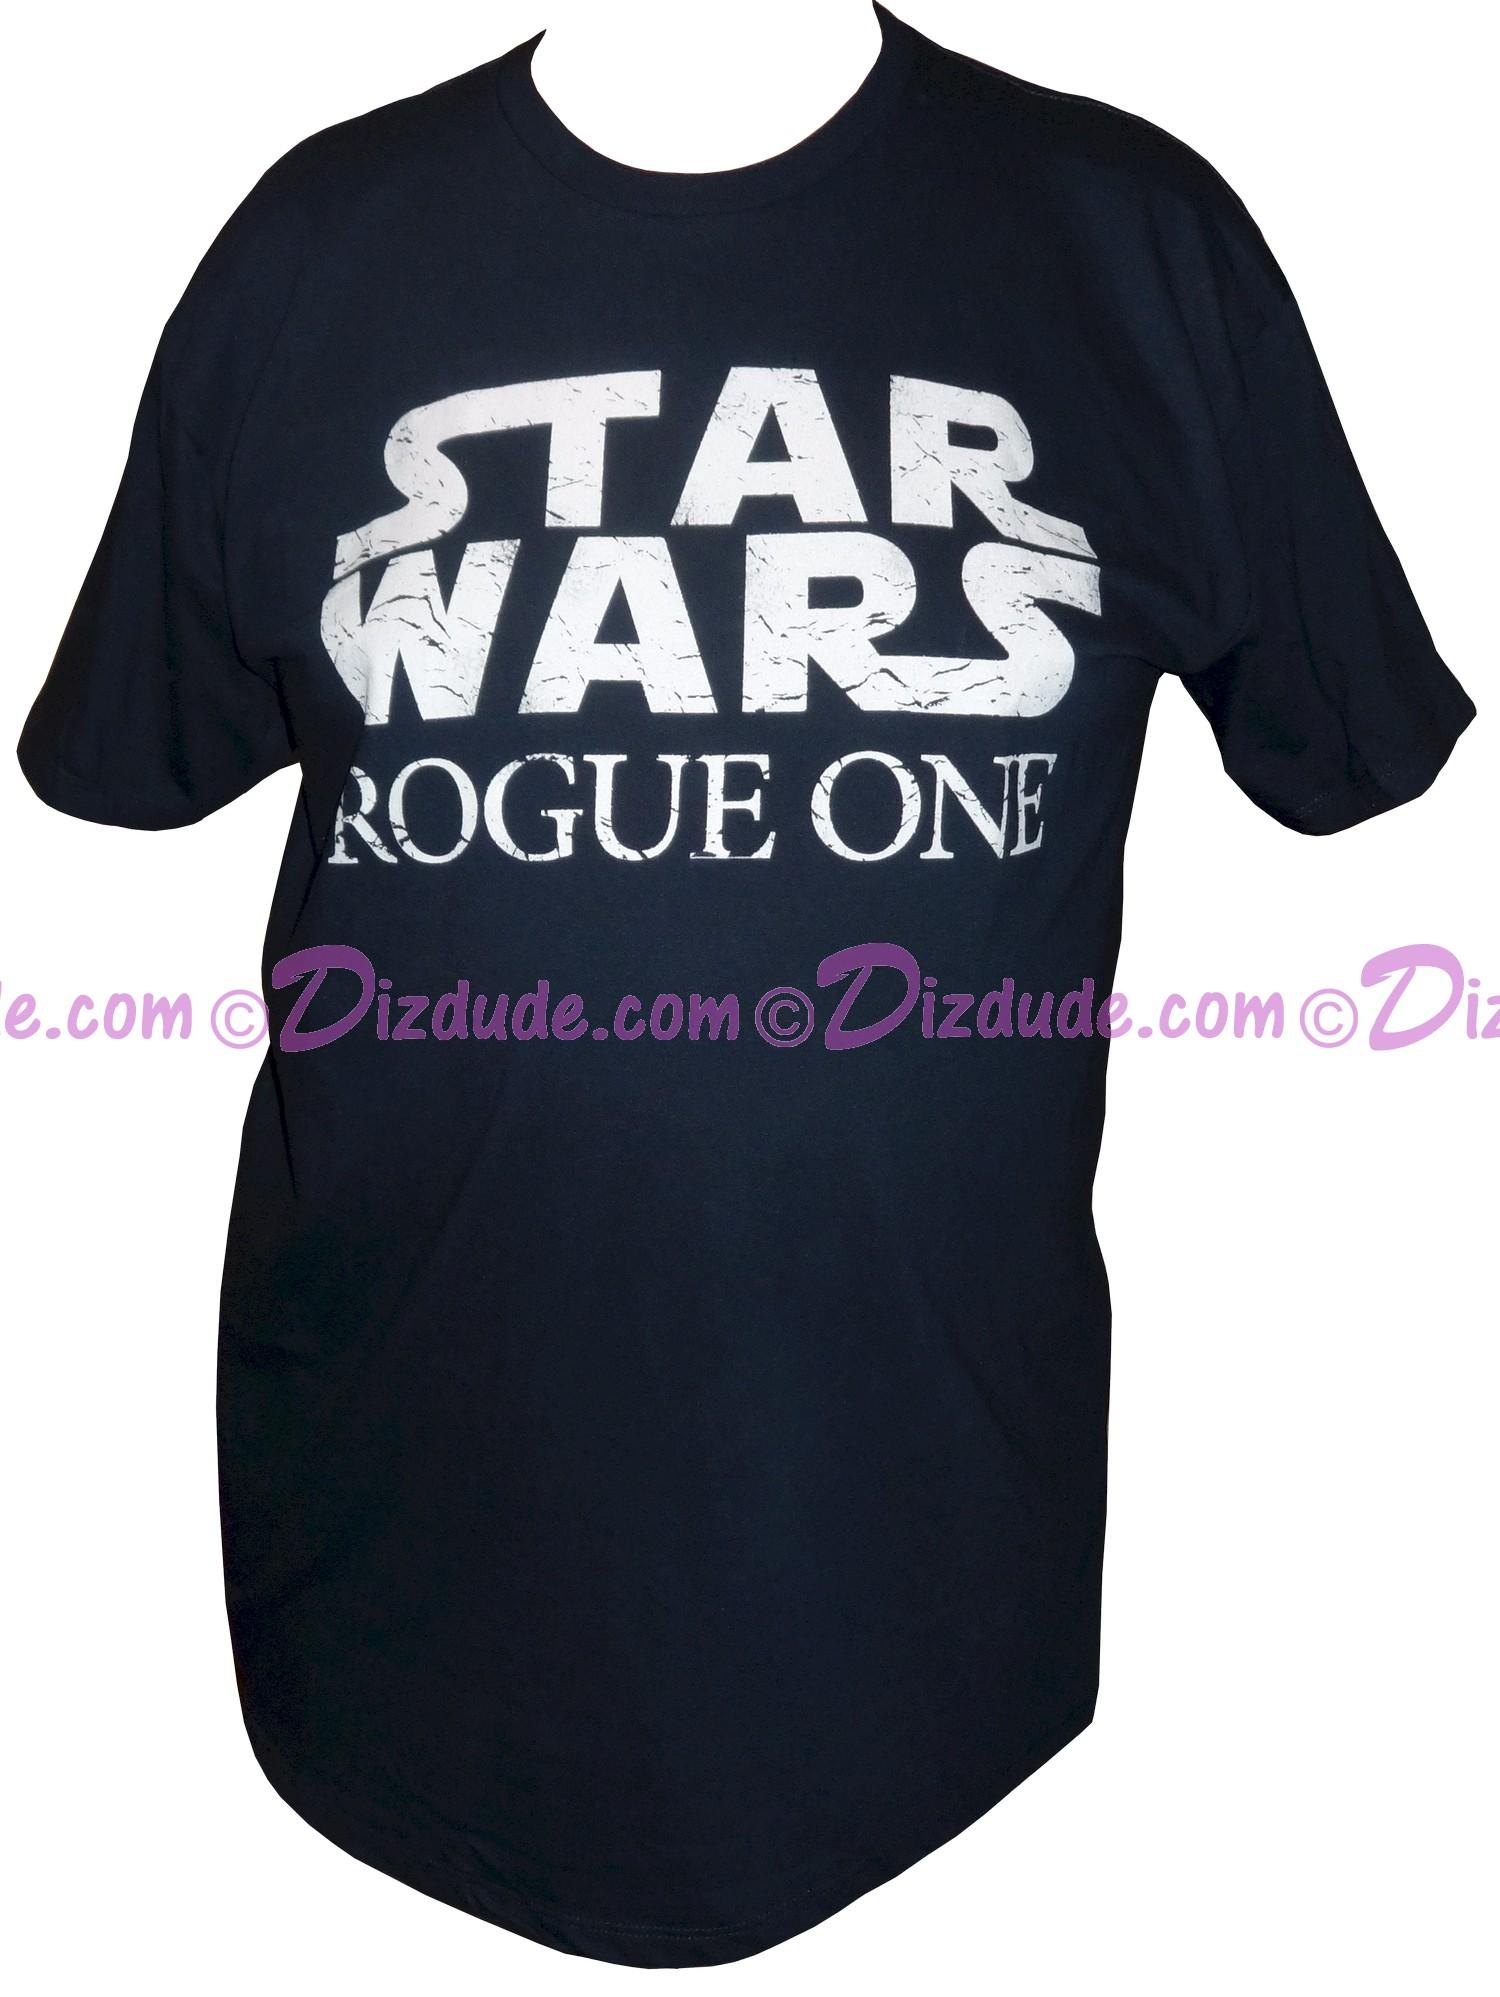 Rogue One Logo Adult T-Shirt (Tshirt, T shirt or Tee) - Disney's Star Wars